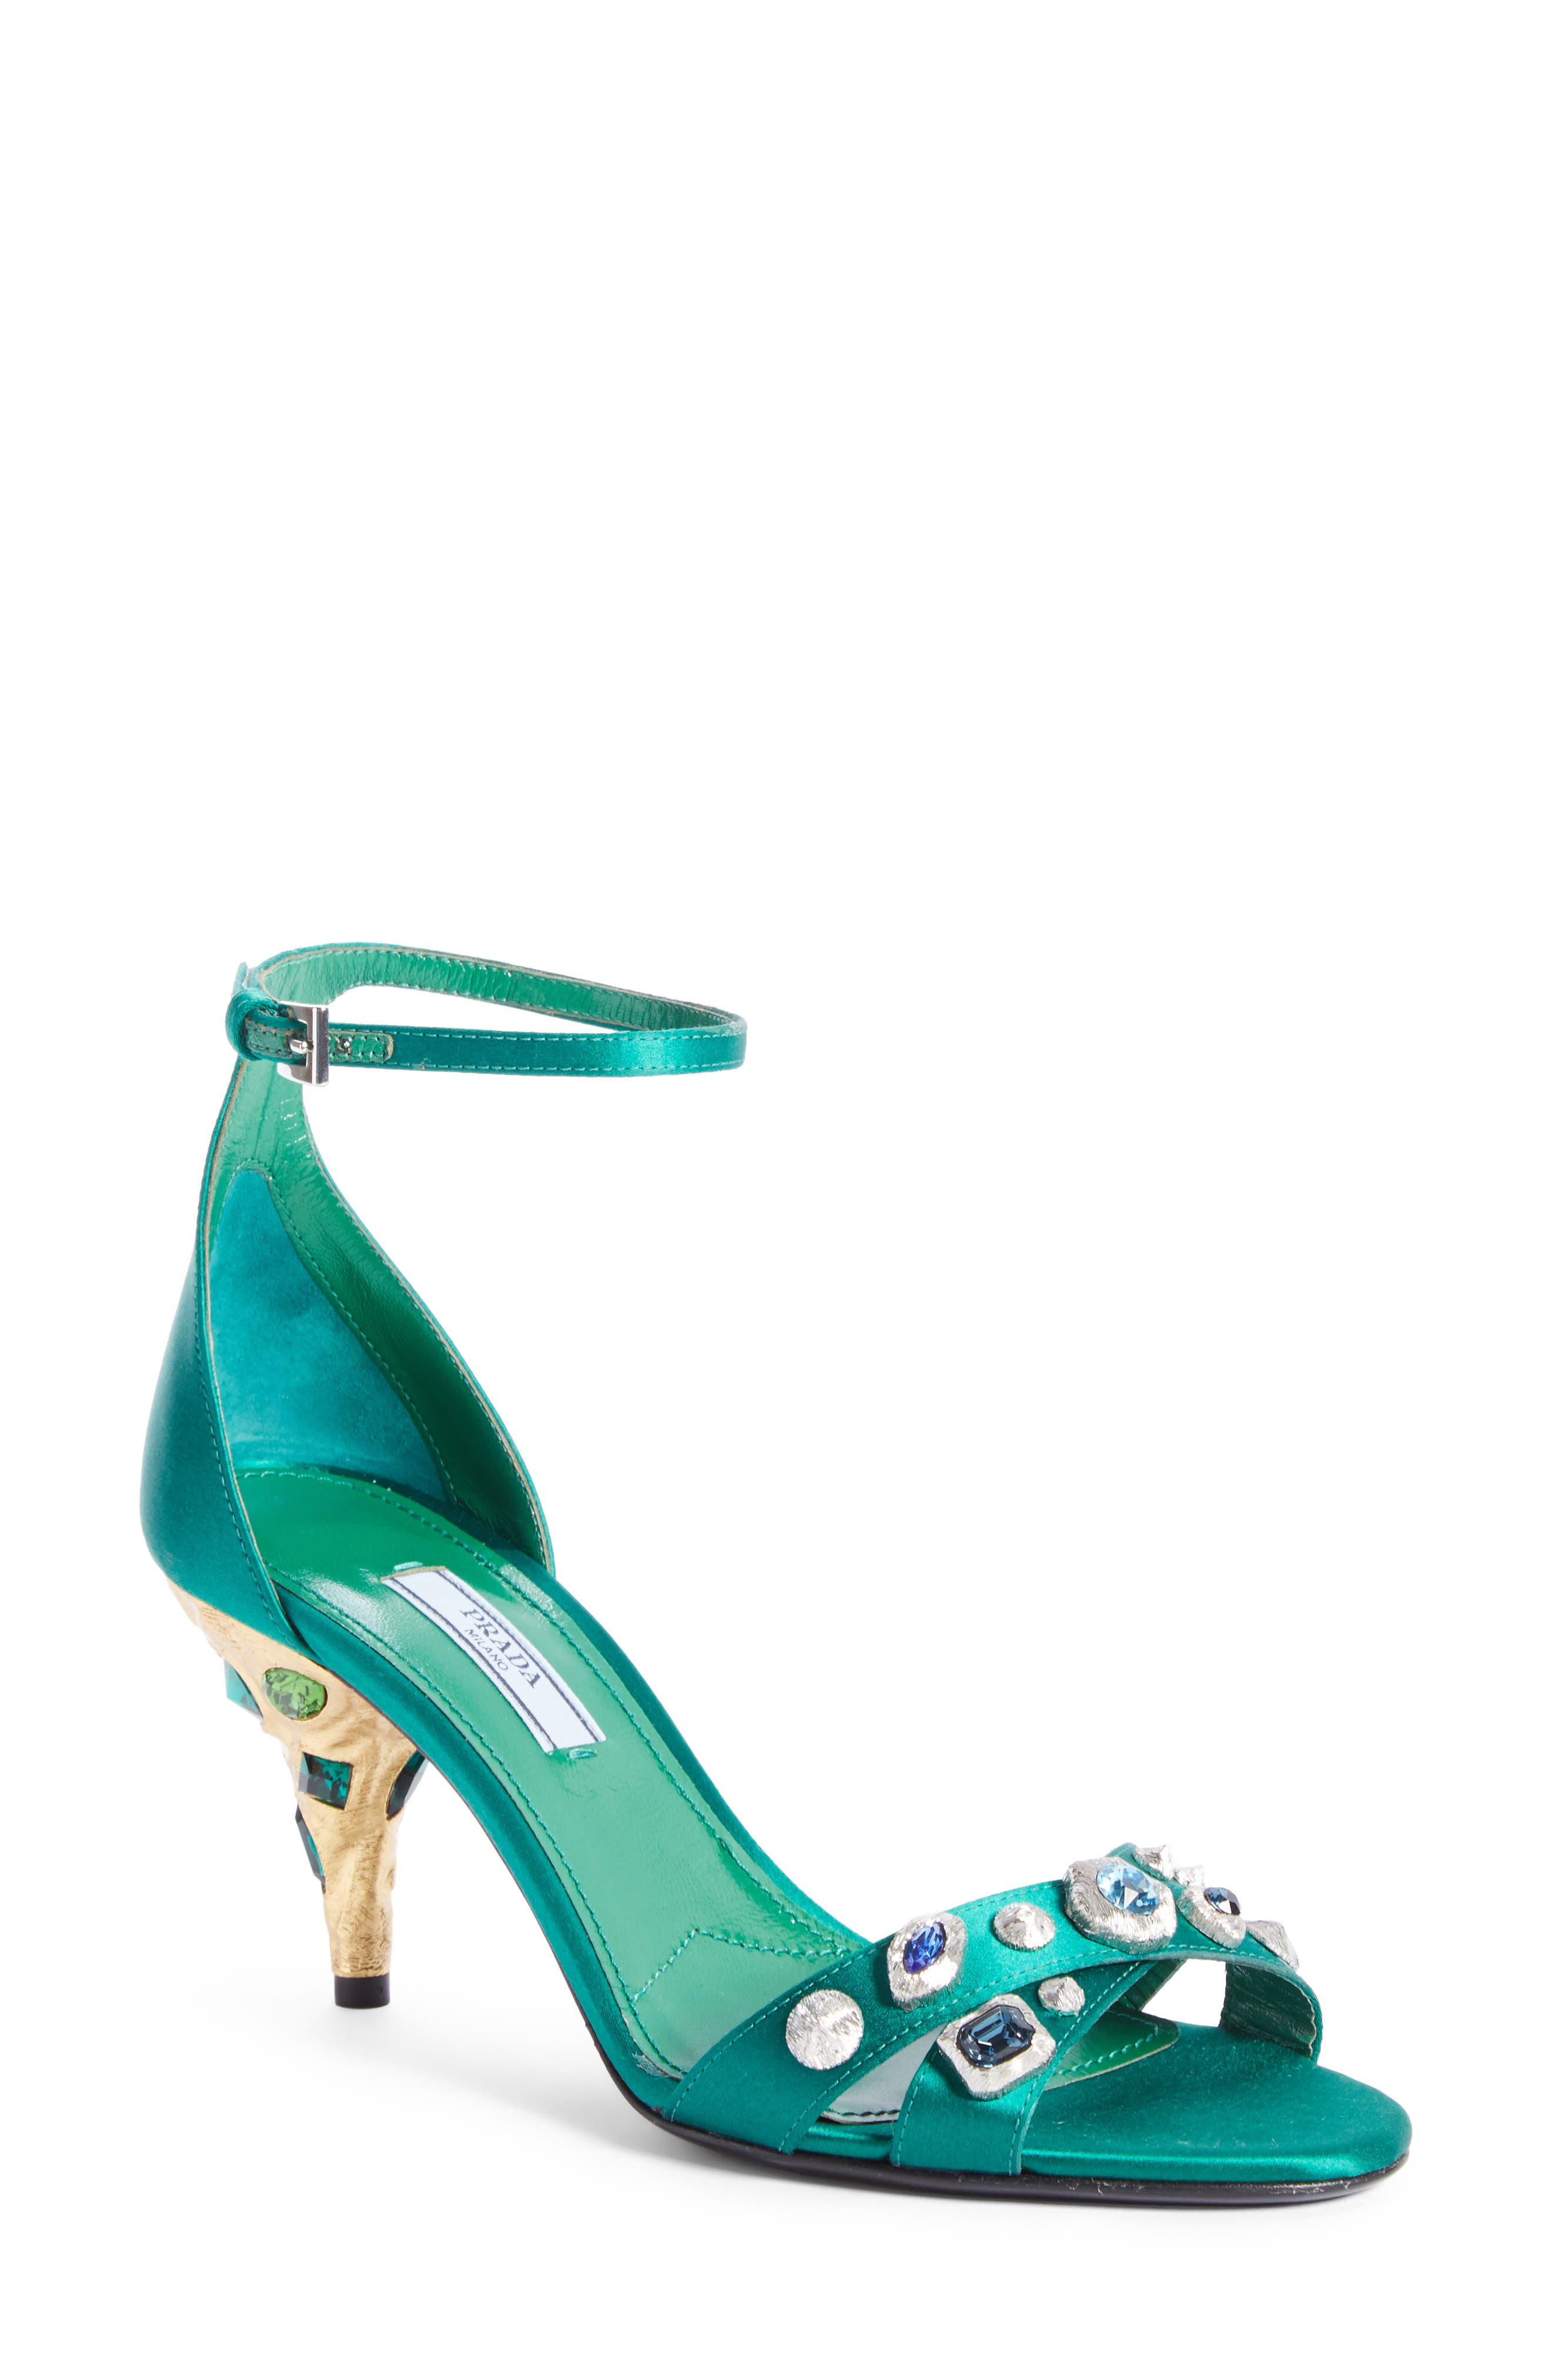 Main Image - Prada Jewel Ankle Strap Sandal (Women)